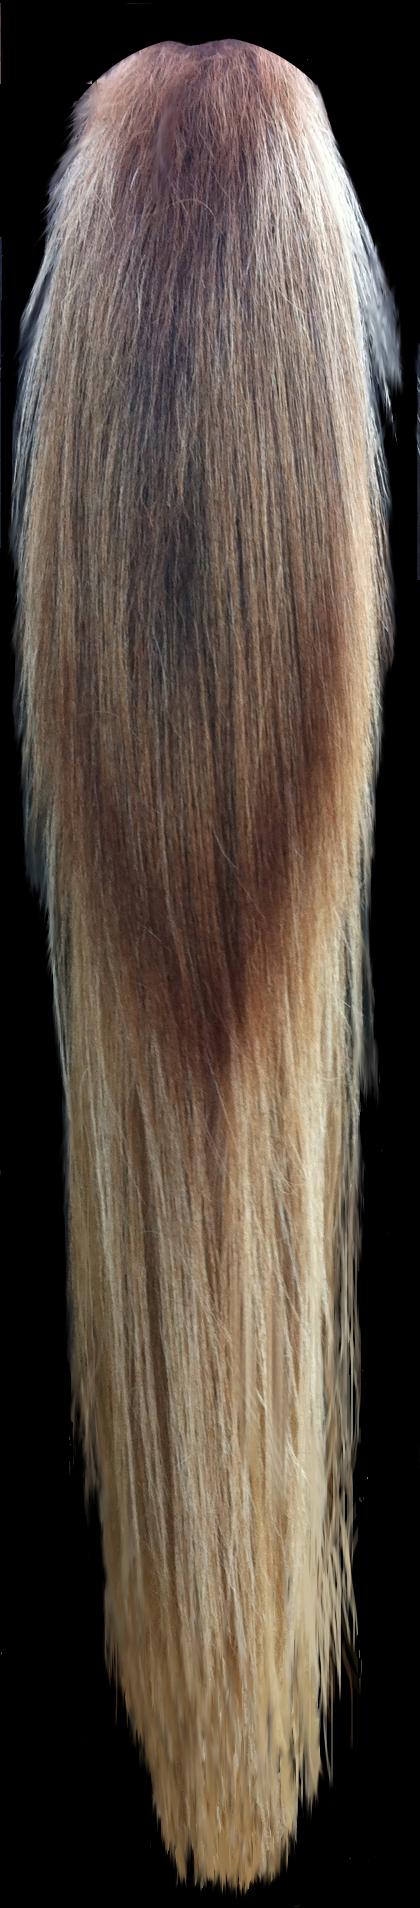 Look at this beautiful mane of blonde hair!